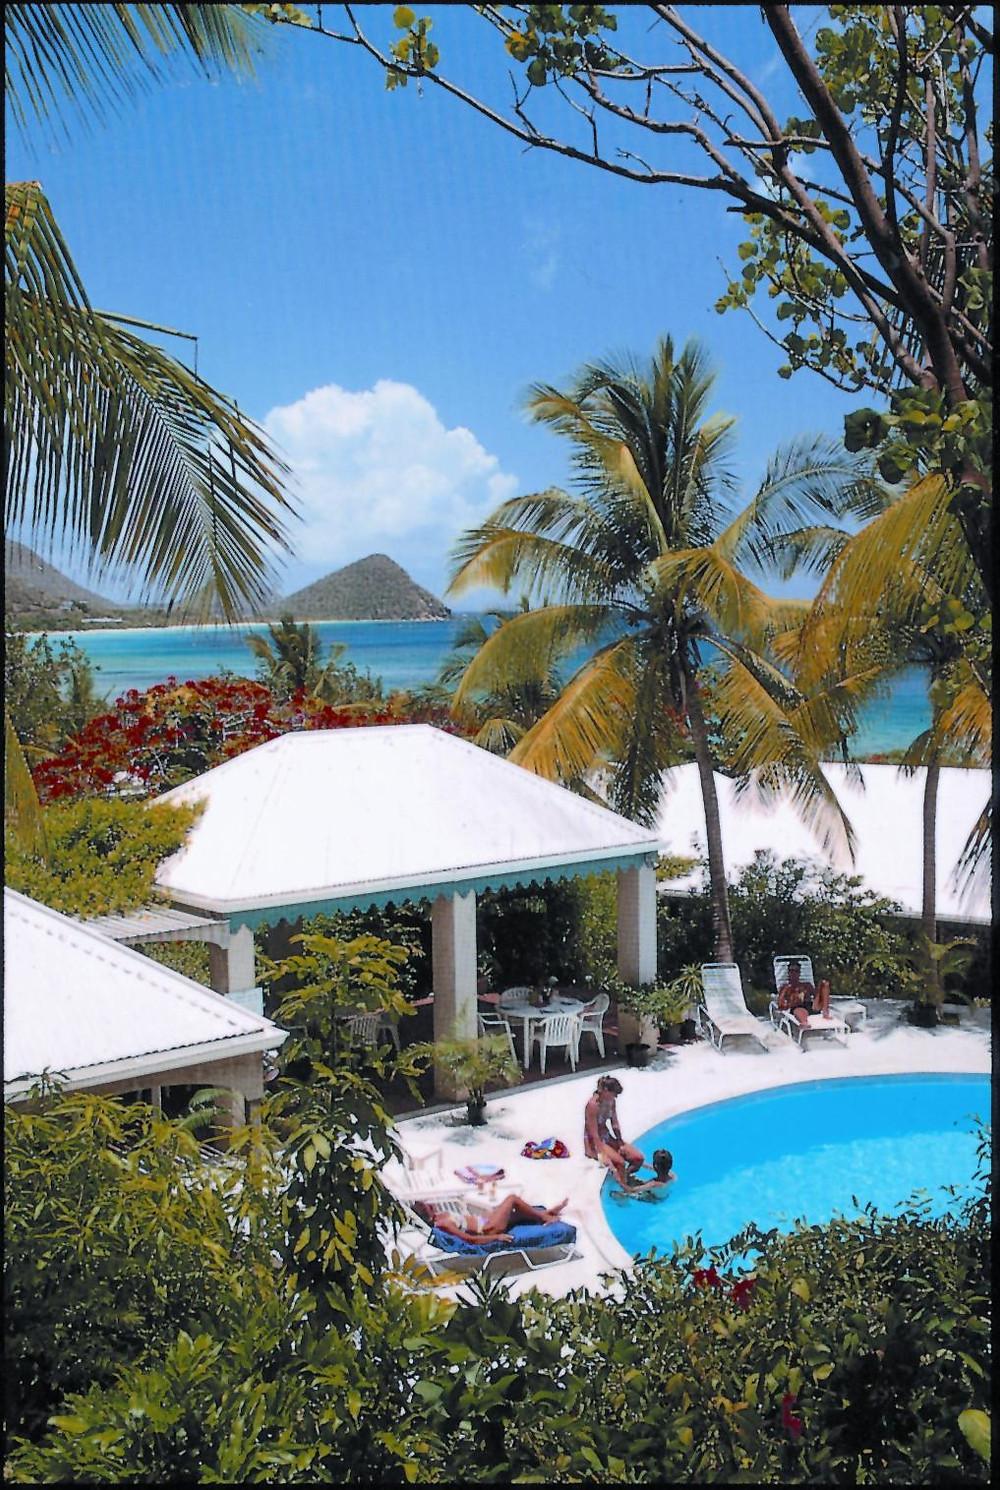 The pool at Sugar Mill Hotel on Tortola